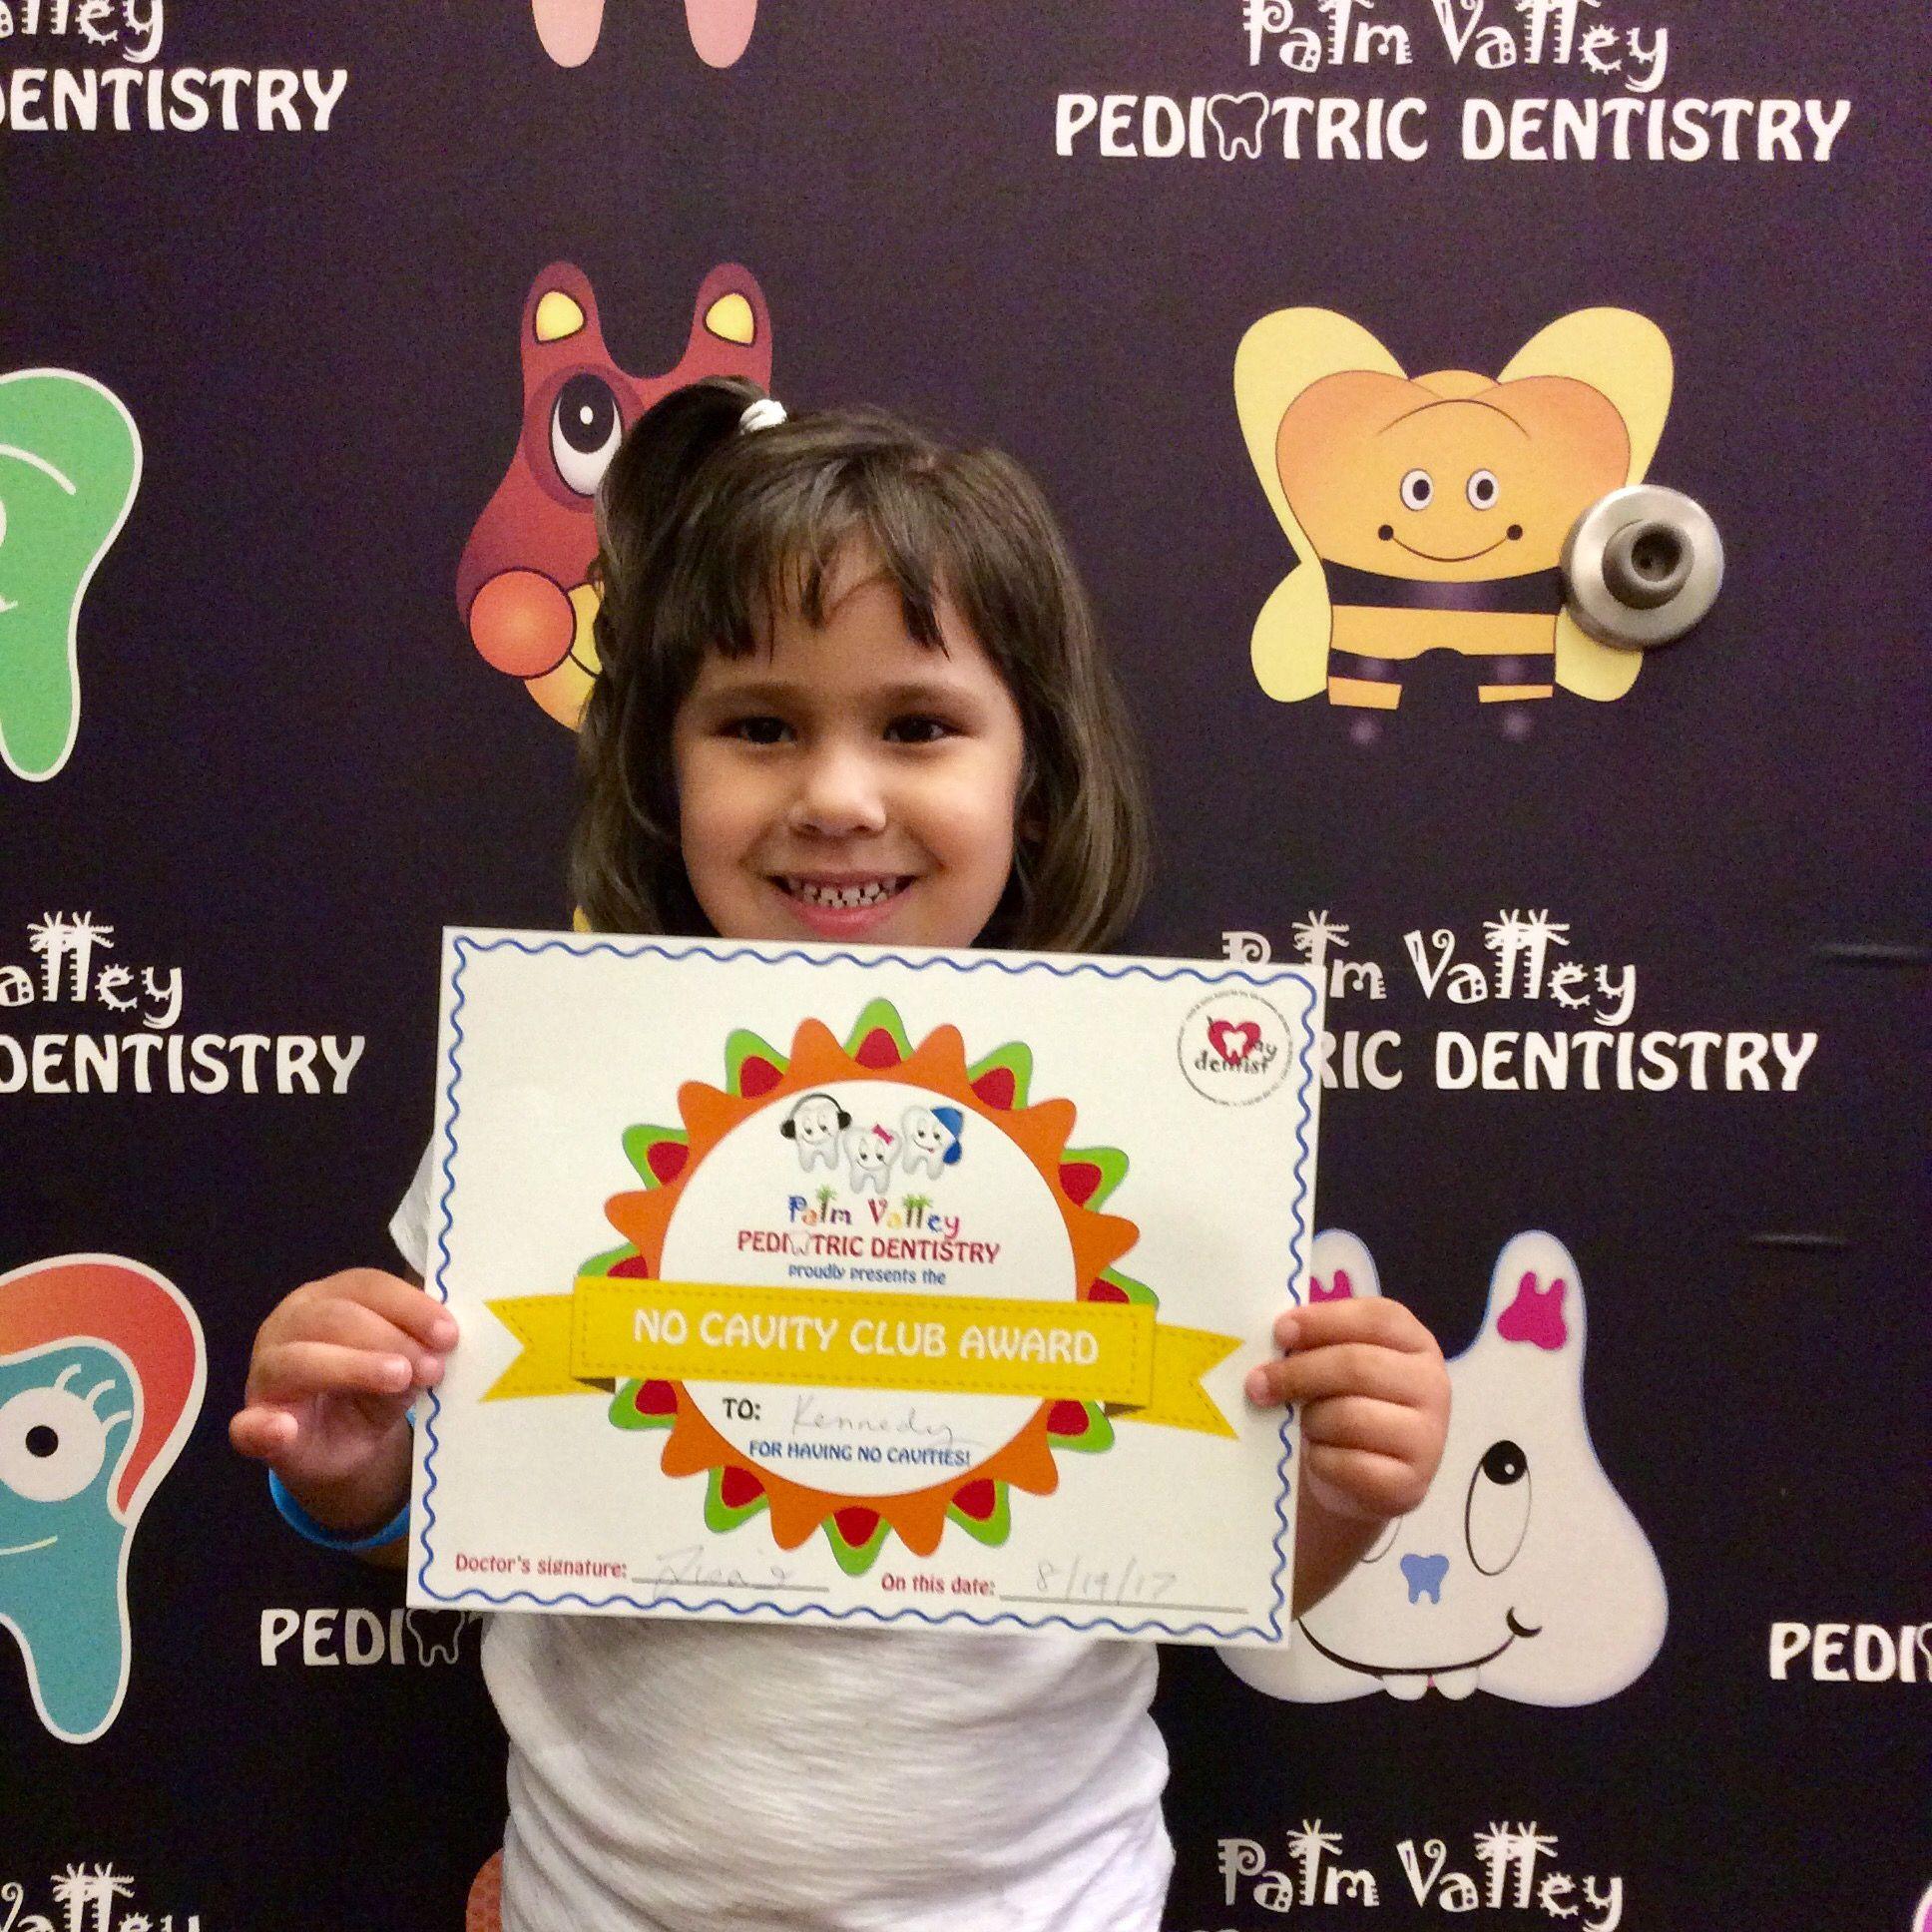 PVPD  Palm Valley Pediatric Dentistry pvpd pvpd kid